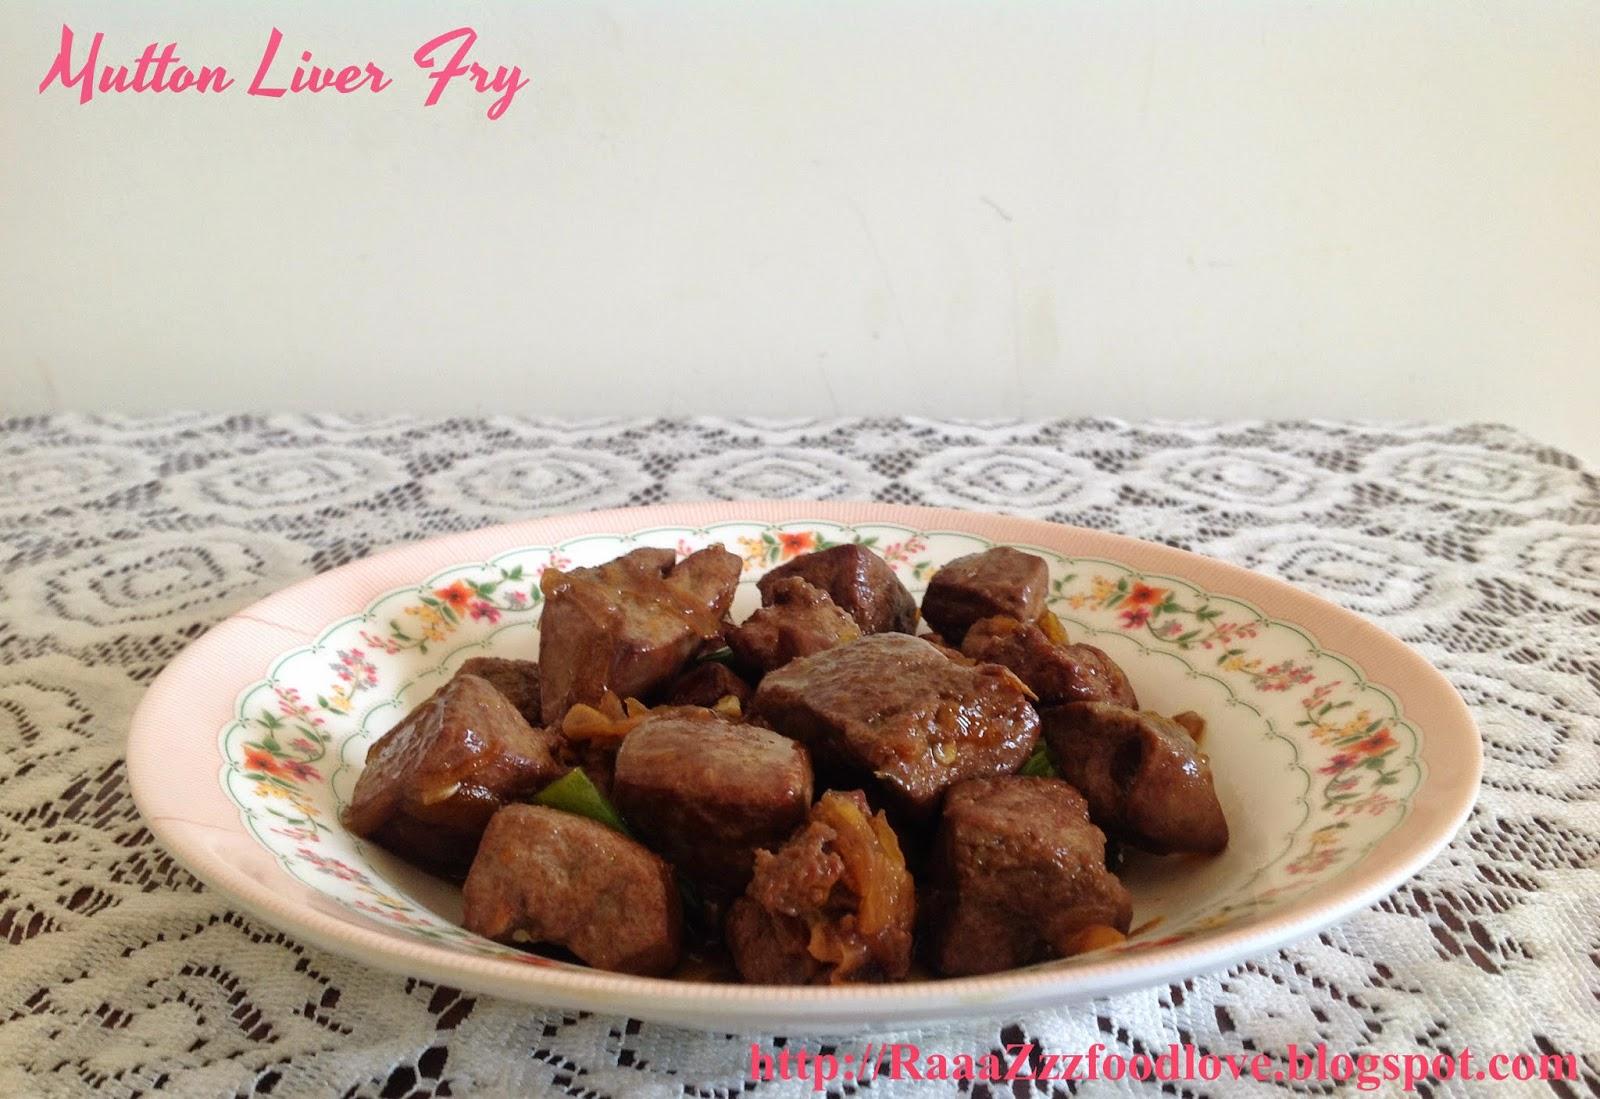 http://raaazzzfoodlove.blogspot.in/2014/01/mutton-liver-fry-bhuni-kaleji.html